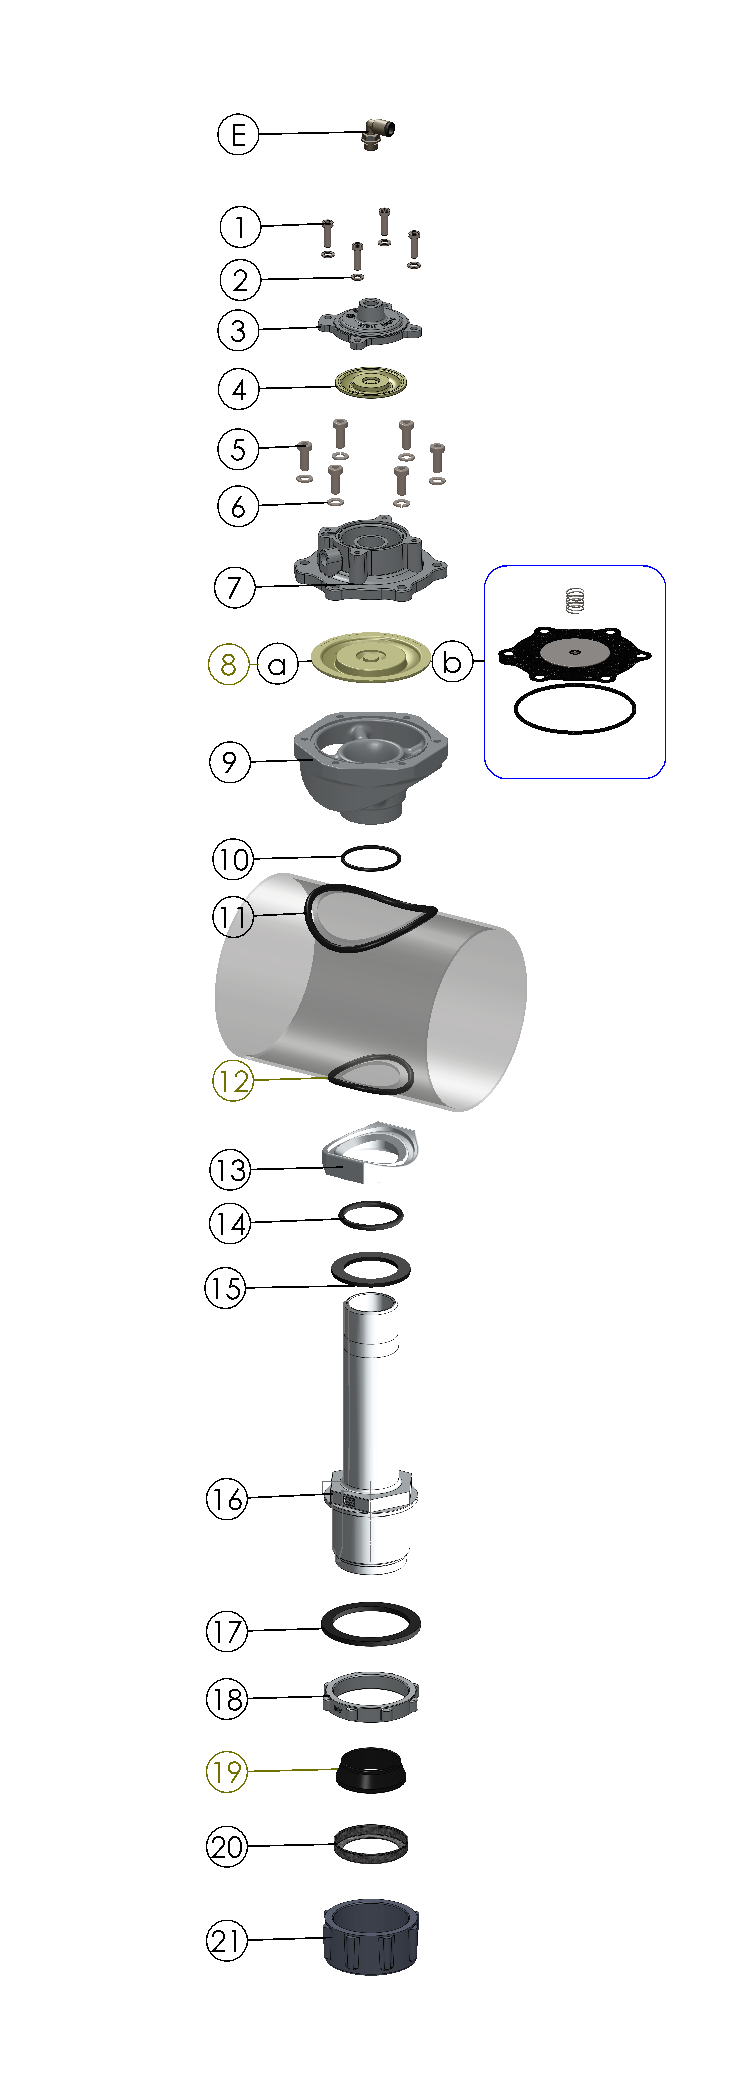 AE2440I06 Con Valvola Pneumatica